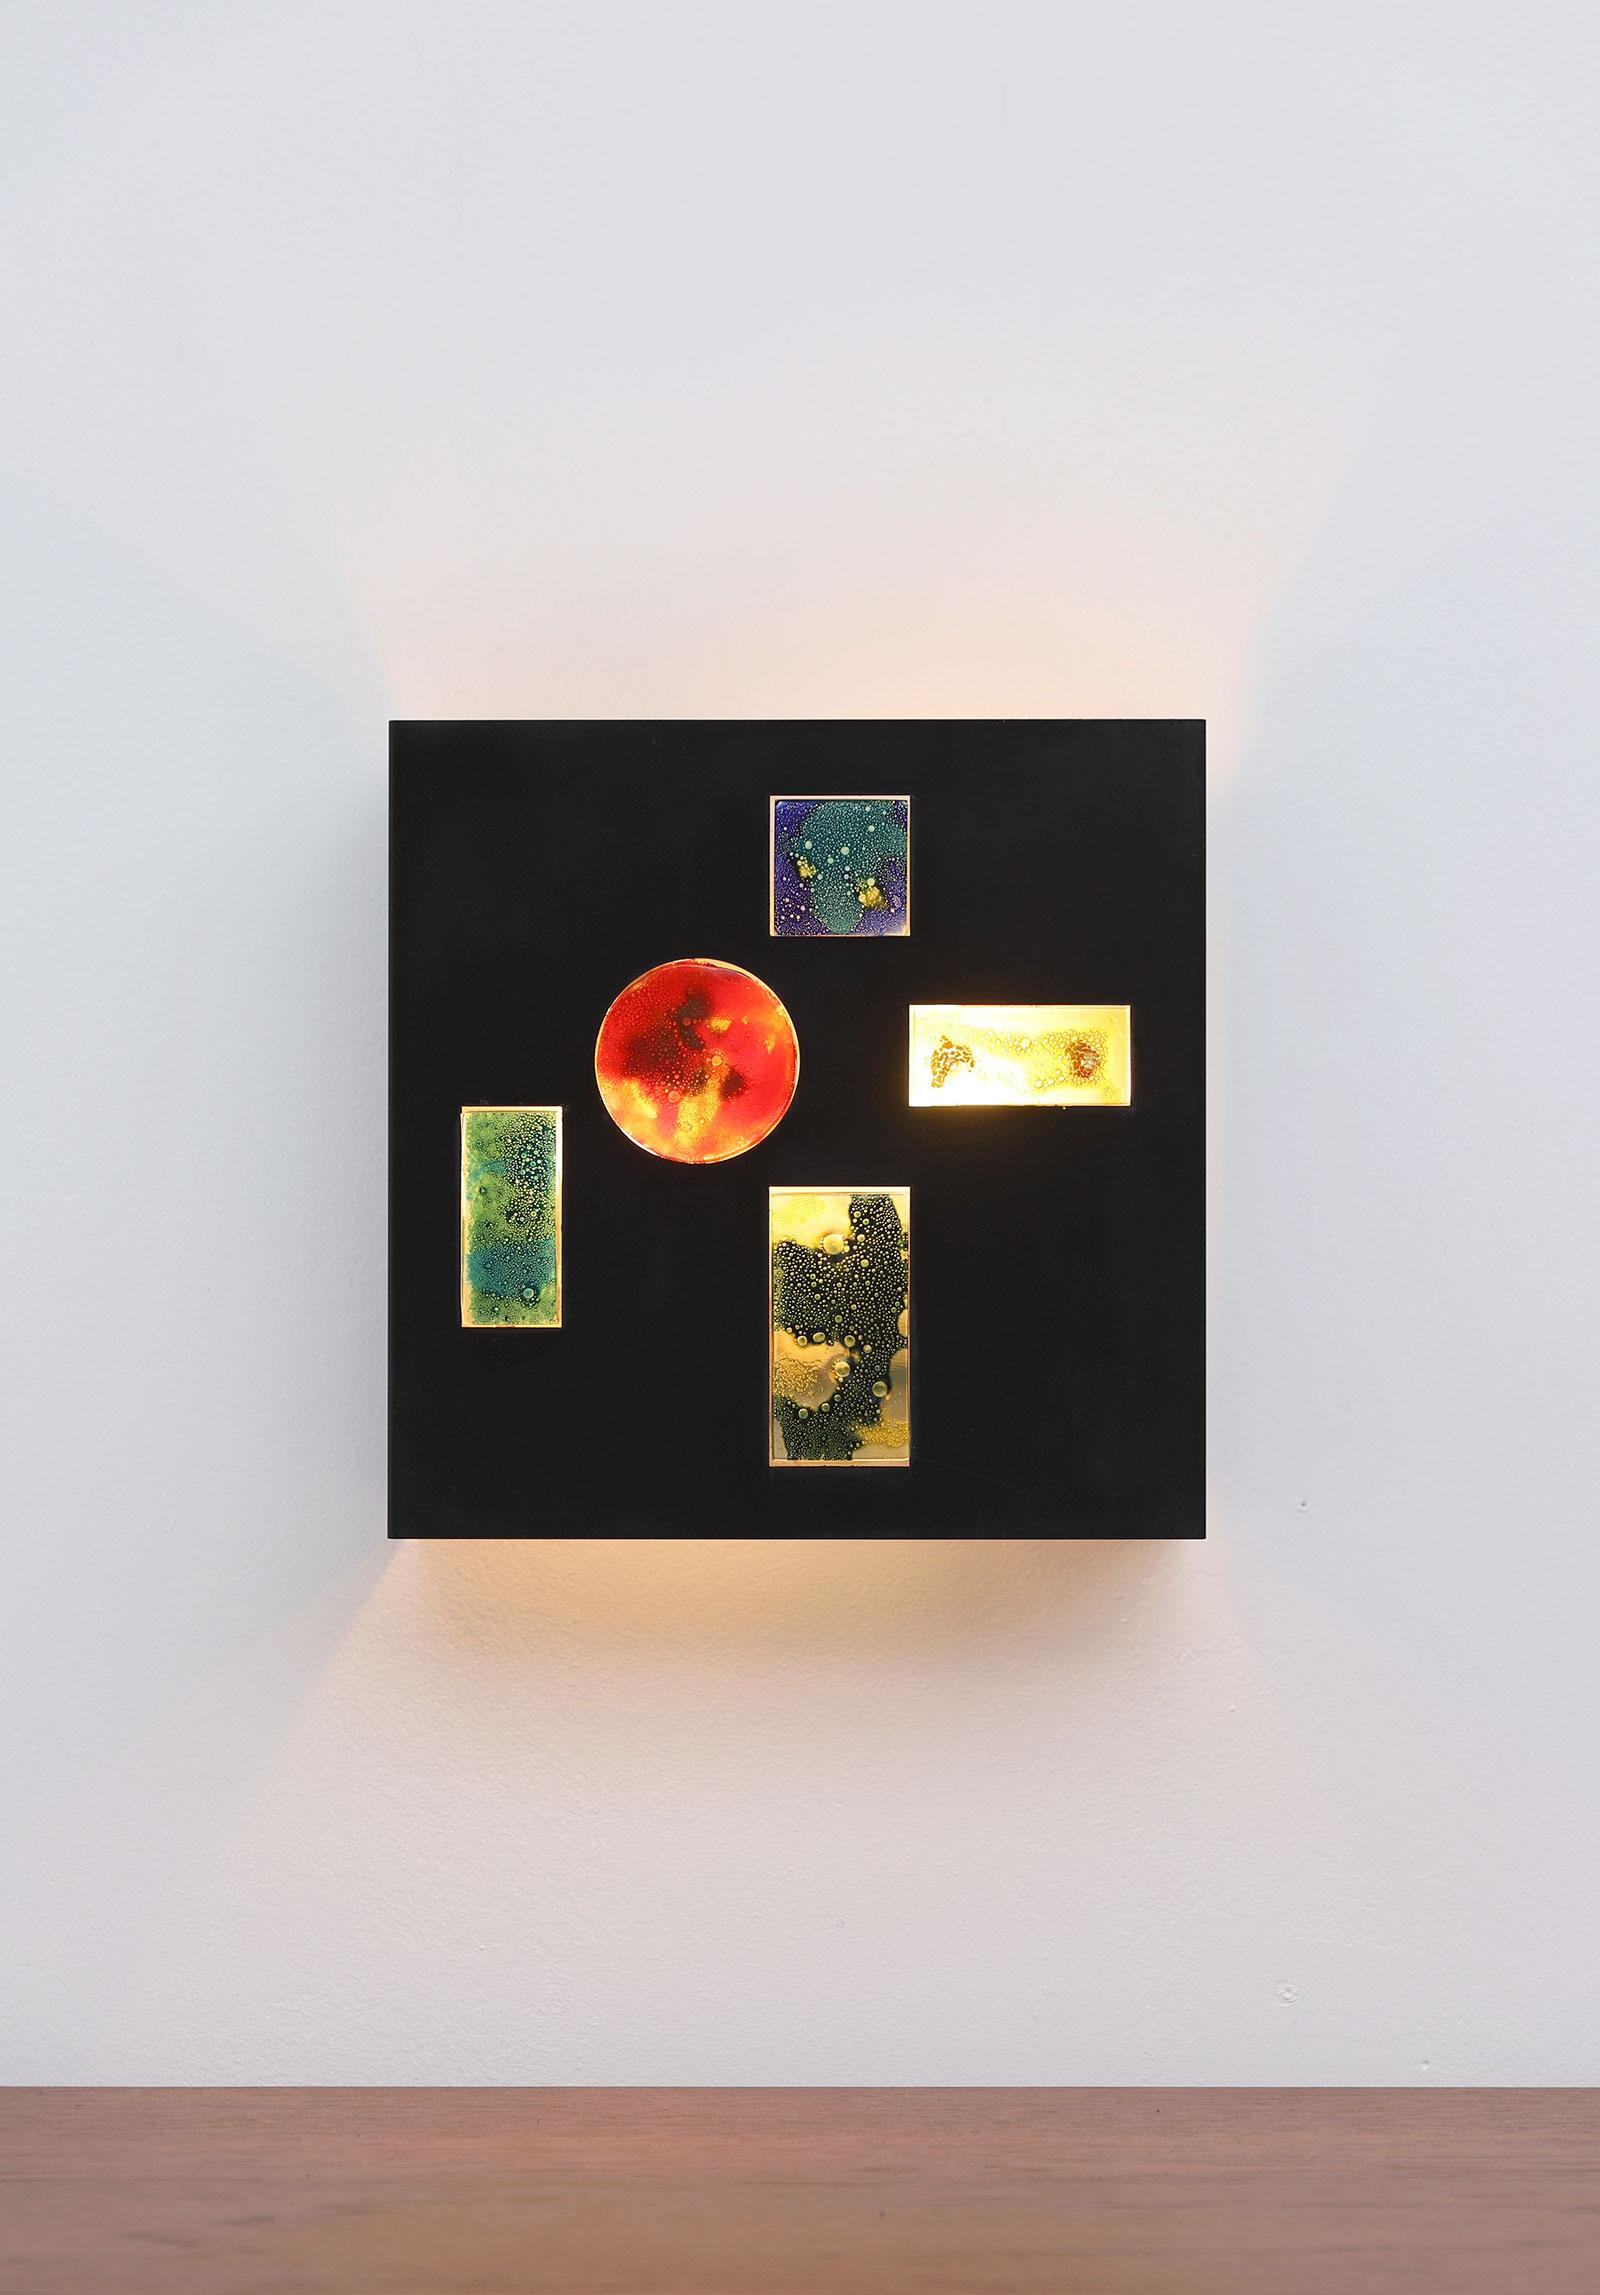 Minimalist wall lamp by Willem van Oyen for Raakimage 2